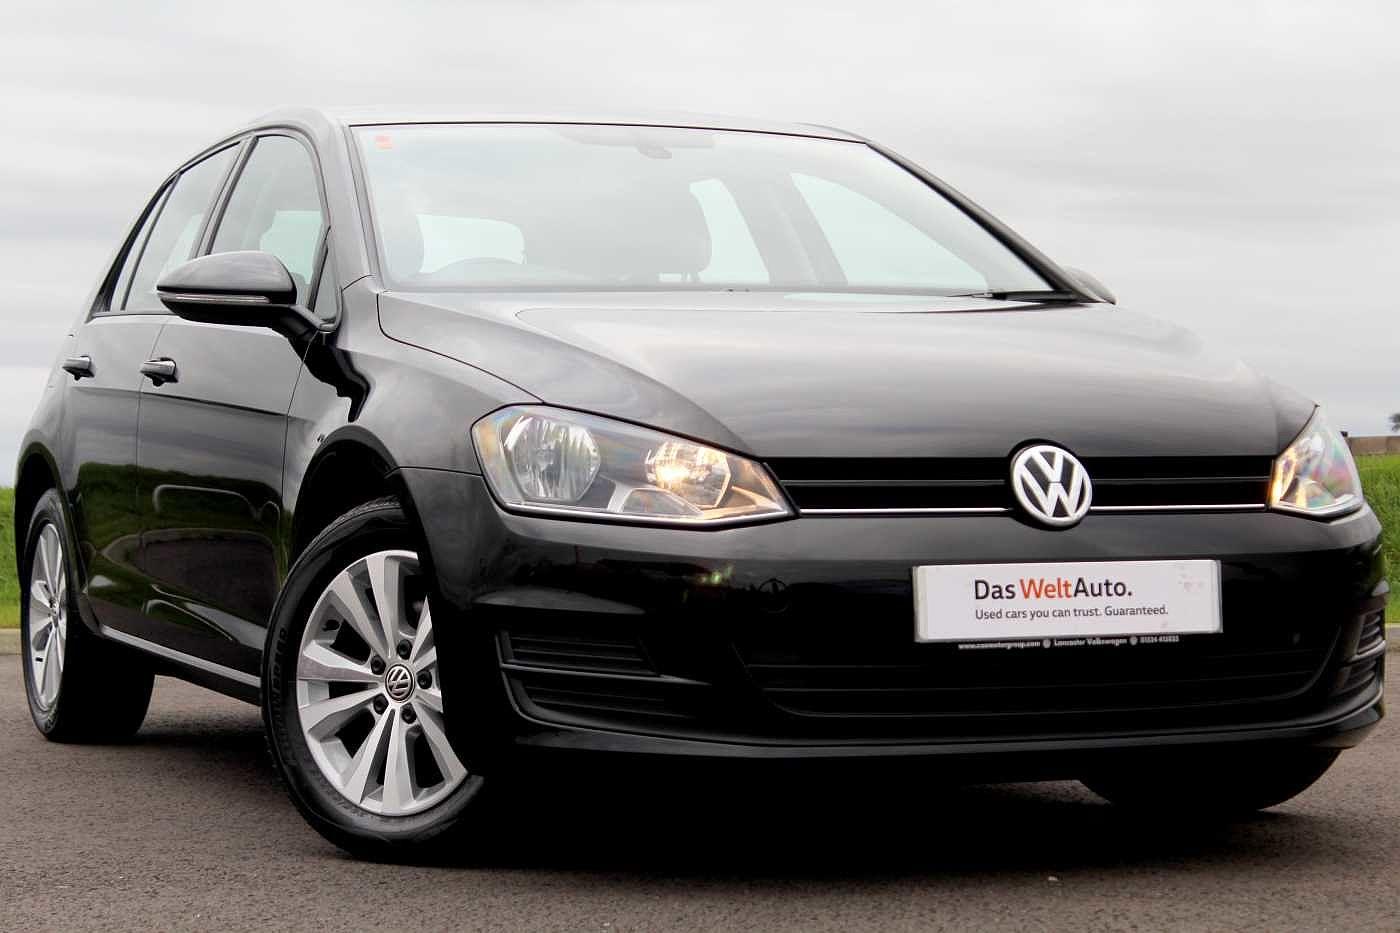 Volkswagen Golf 1.6 TDI SE (105 PS) DSG 5-Dr